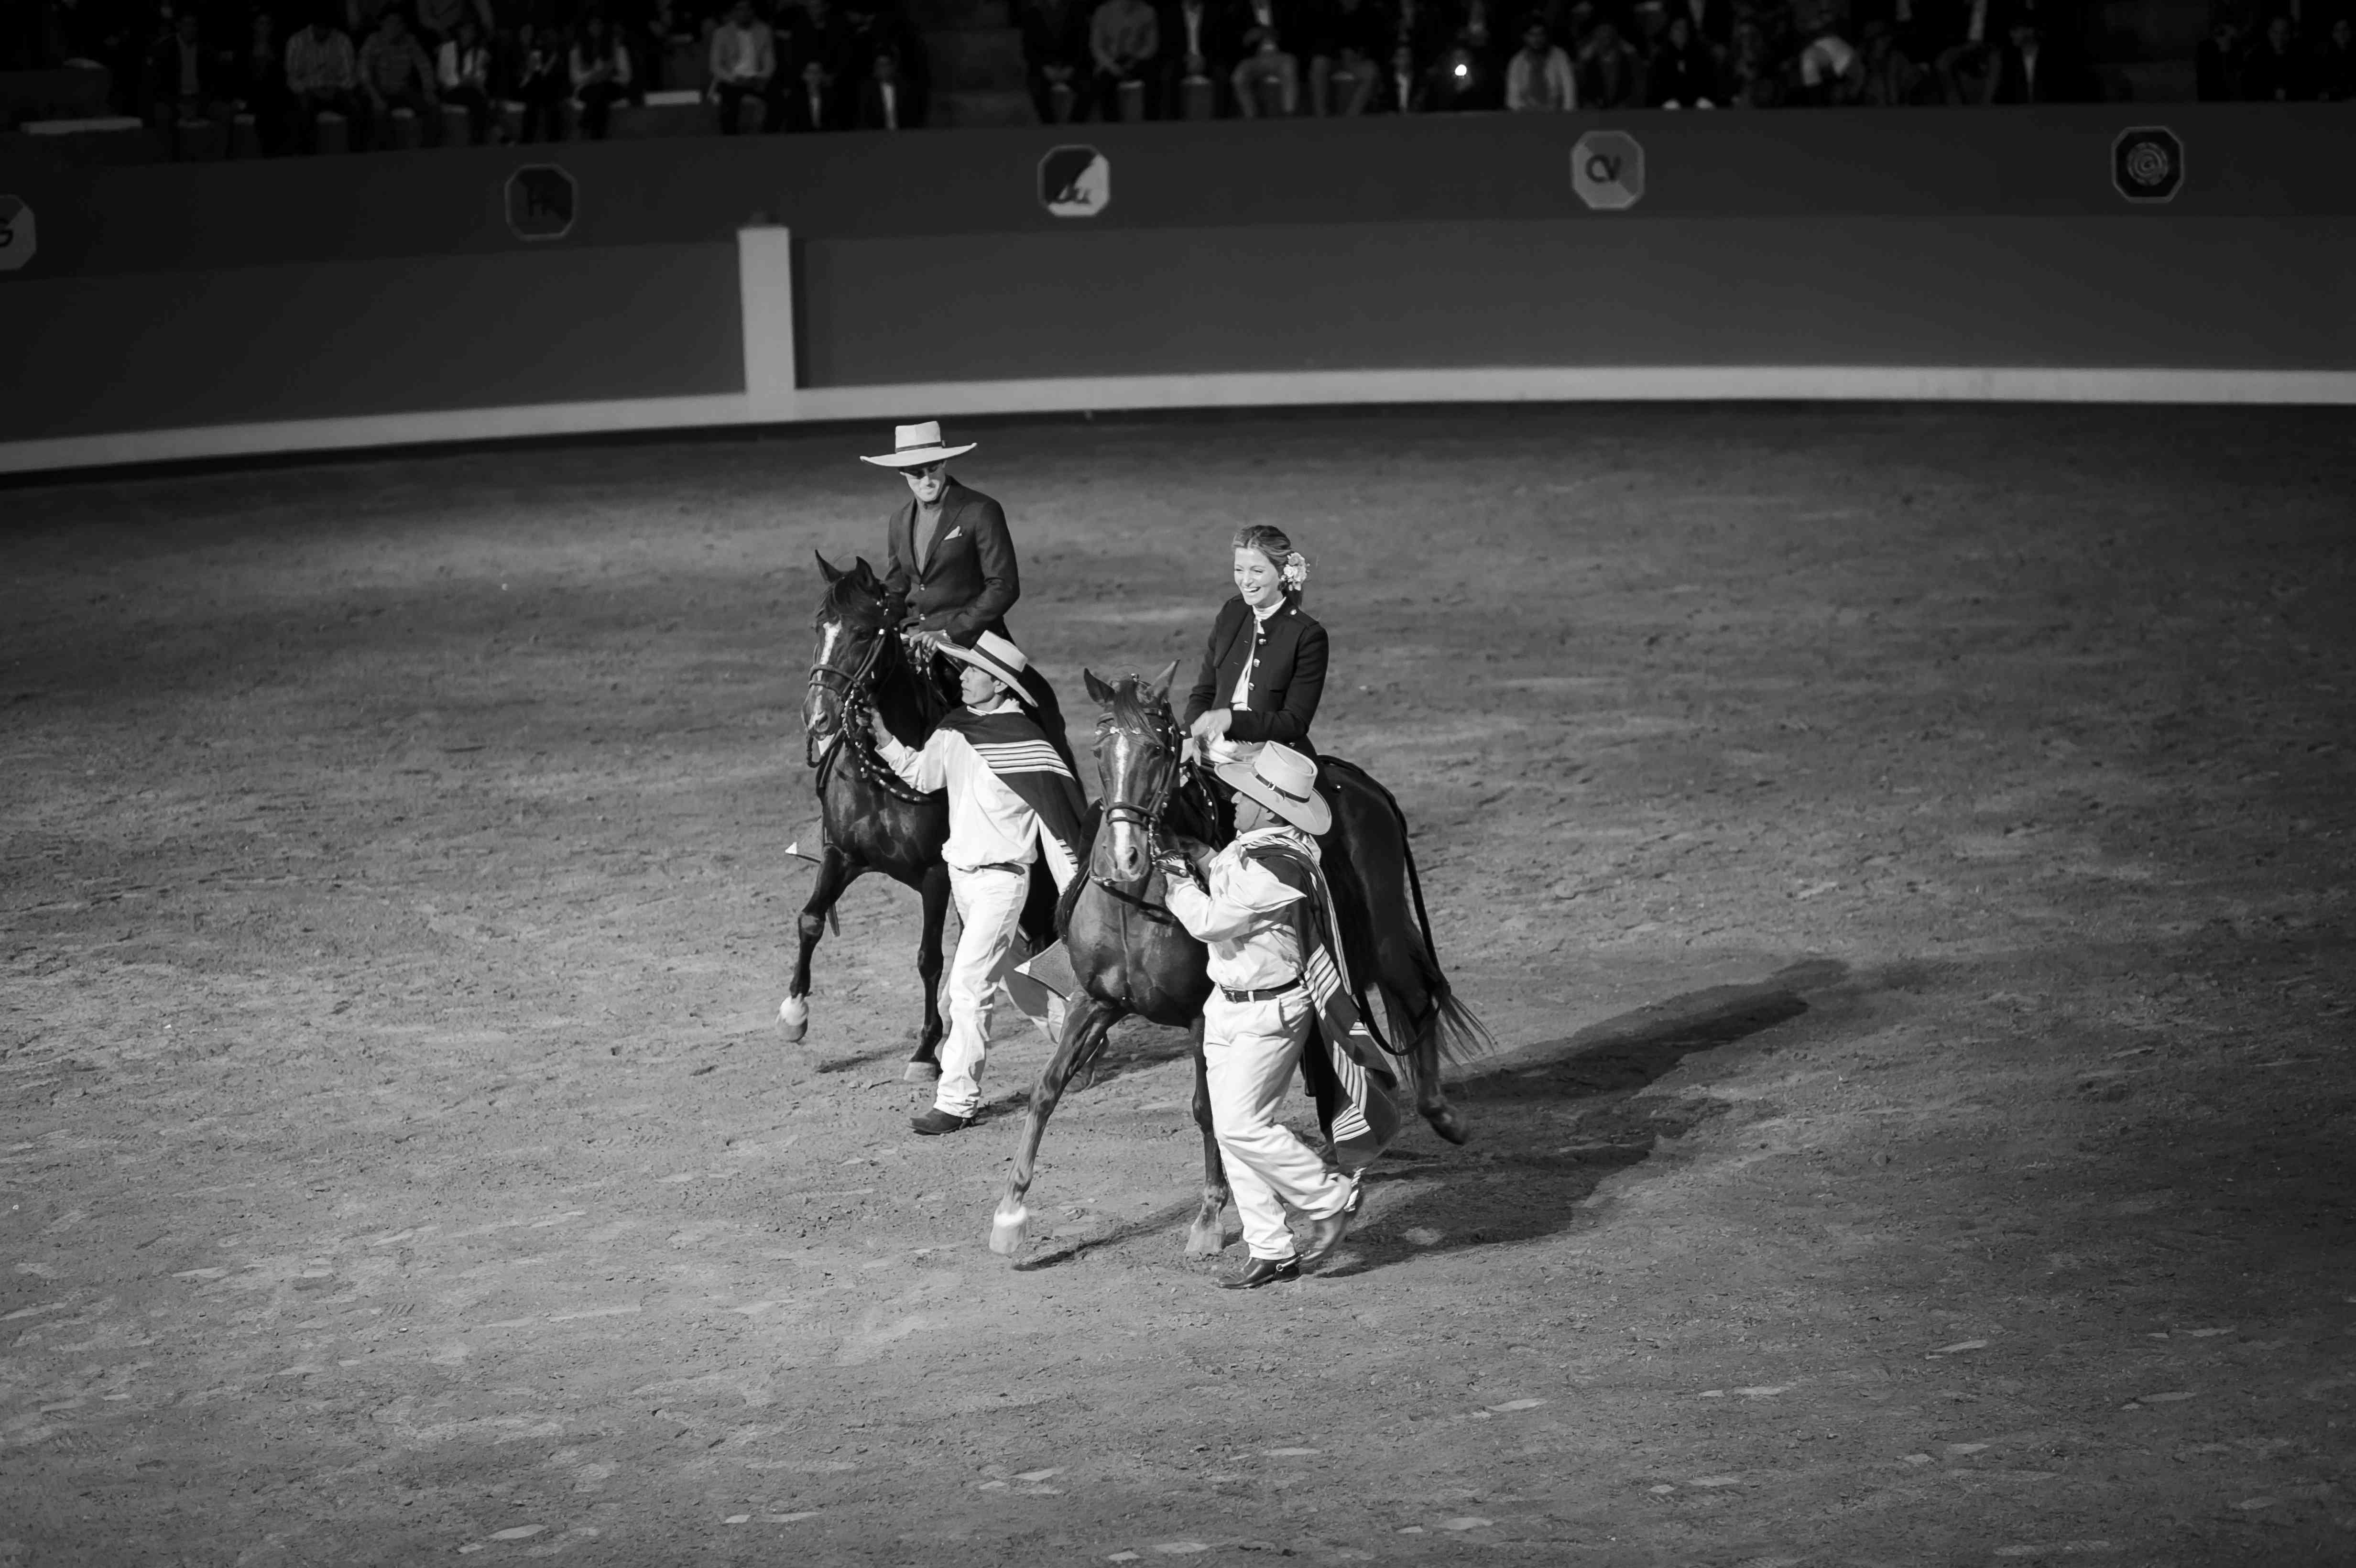 <p>Bride and groom on horseback</p><br><br>